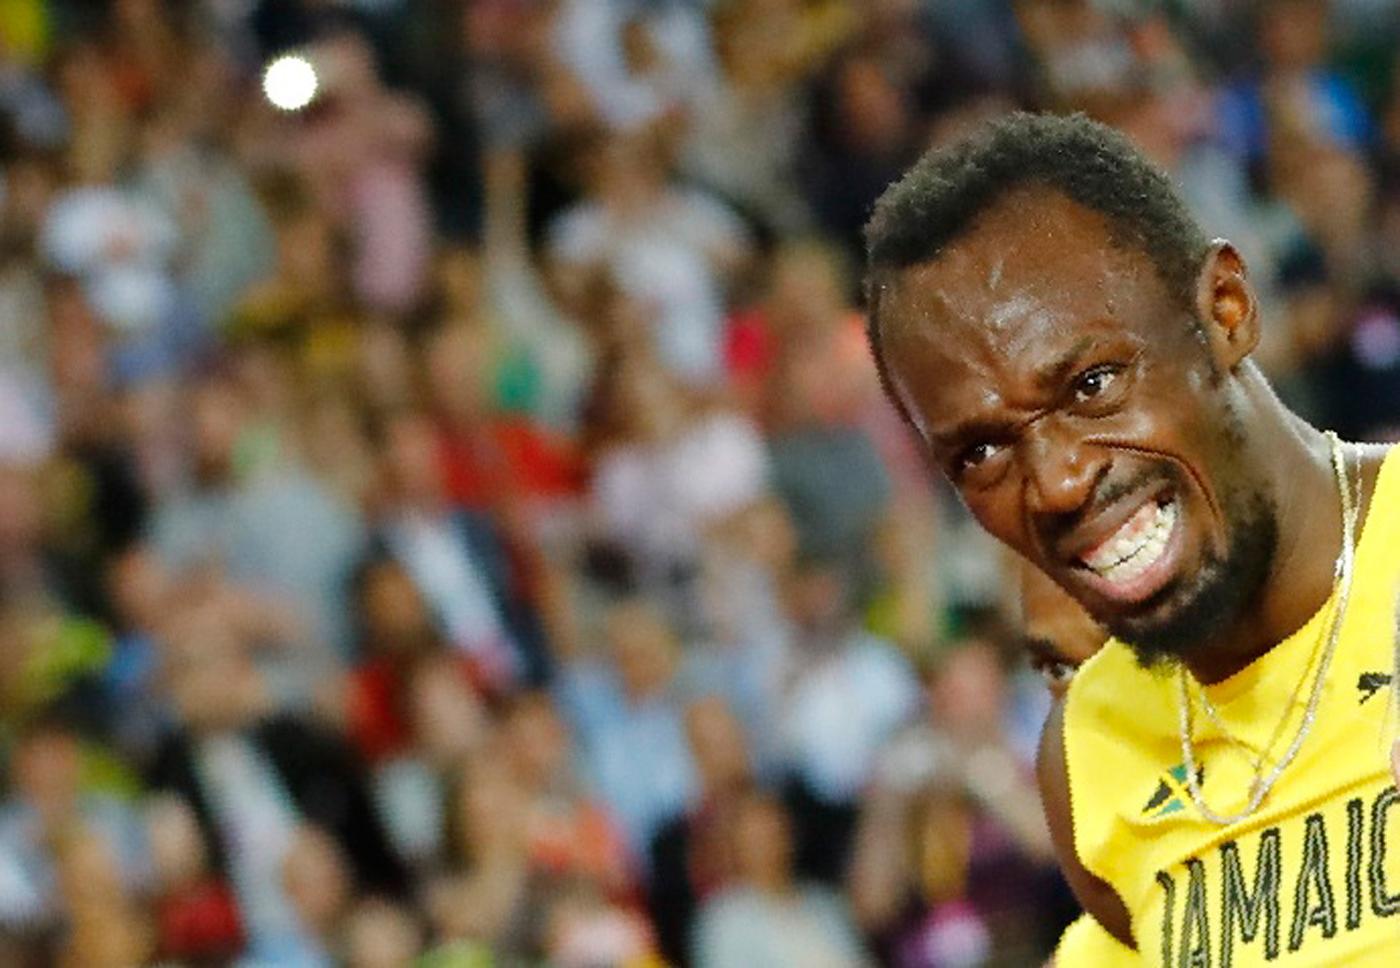 Atletismo - Campeonato Mundial de Atletismo - Final Posta Masculina 4x100 Metros - Estadio de Londres, Londres, Reino Unido – 12 de agosto, 2017. Usain Bolt de Jamaica reacciona después de sufrir una lesión. REUTERS/Kai Pfaffenbach